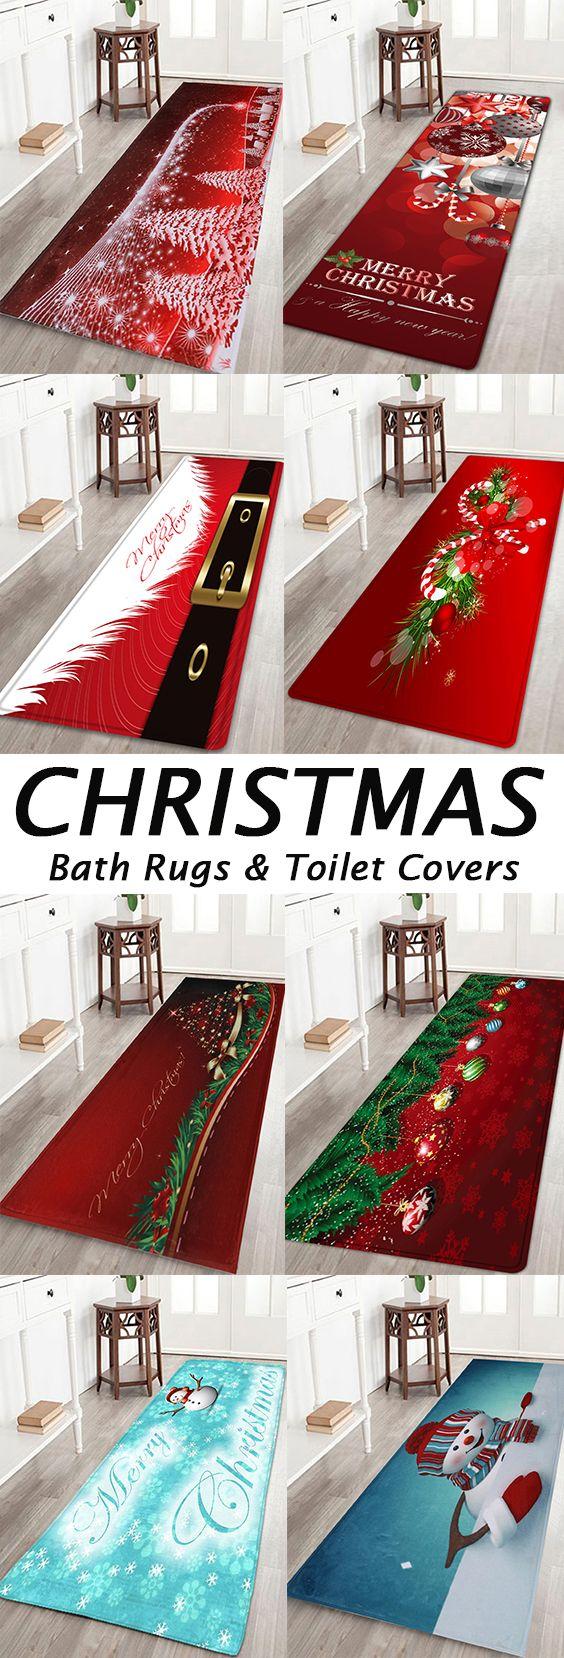 50 Off Christmas Bathroom Products Christmas Bath Rugs Christmas Bathroom Cheap Christmas Trees